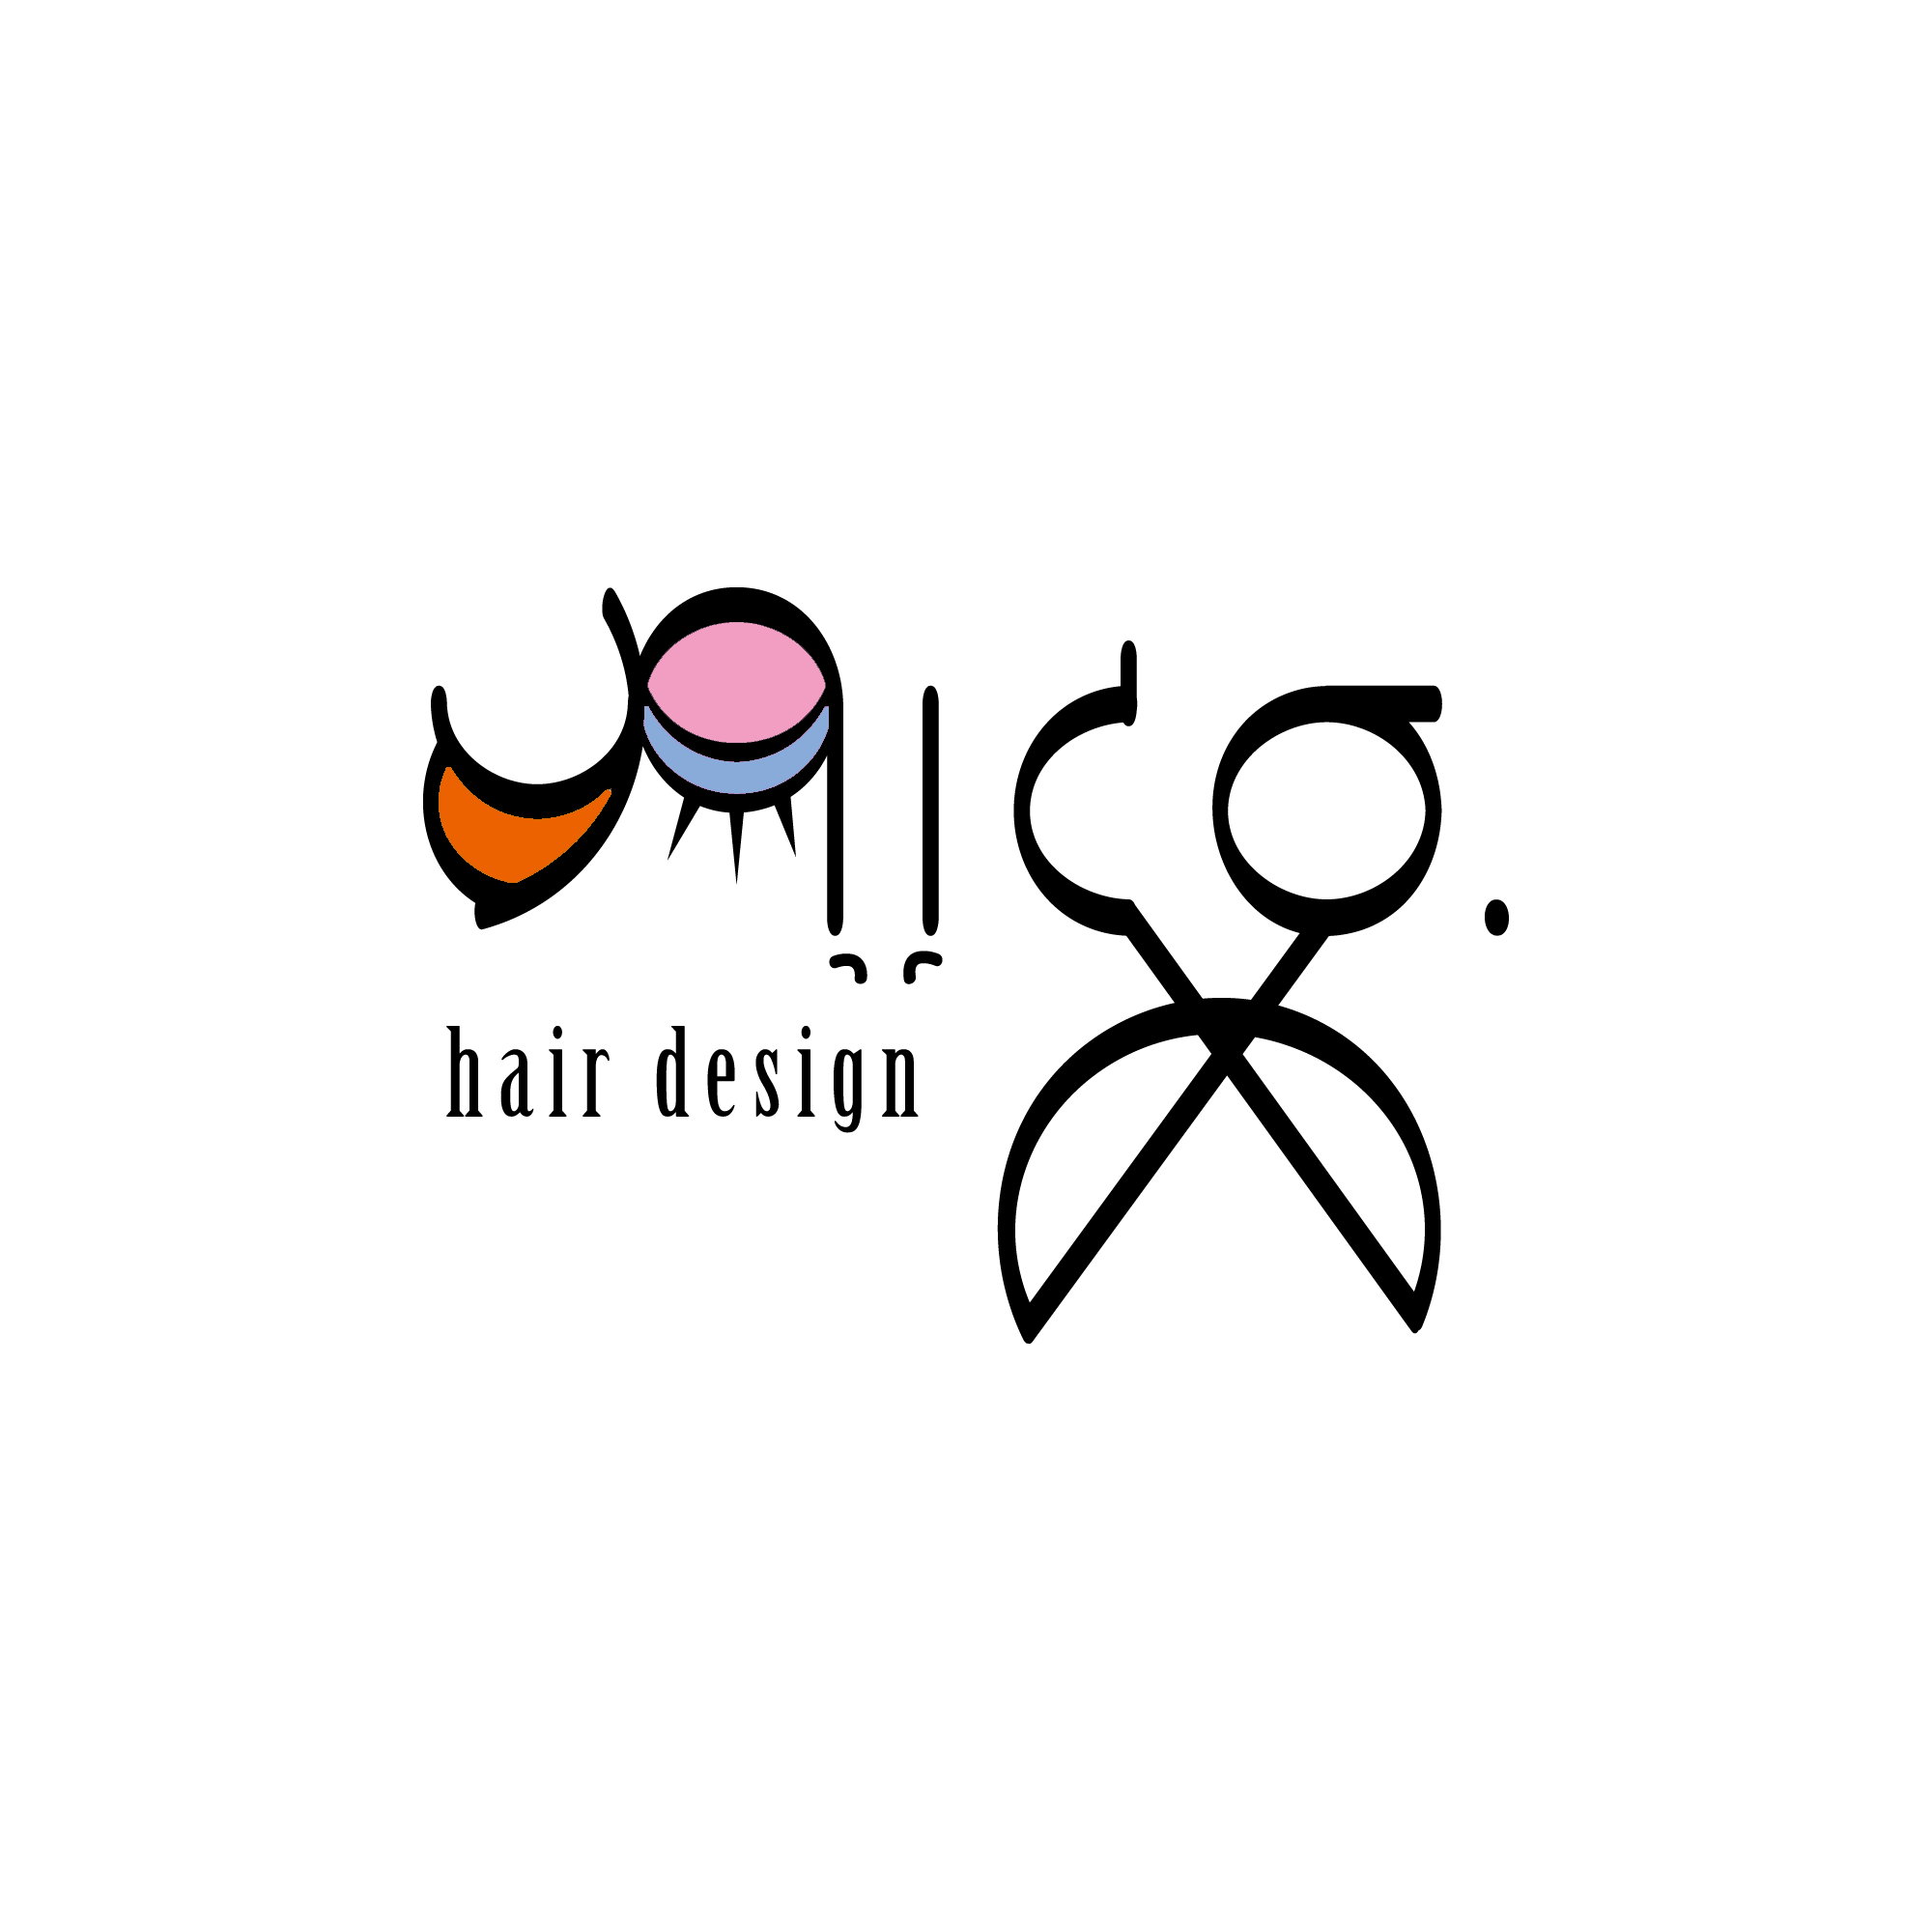 nico.hair design 2 カラー